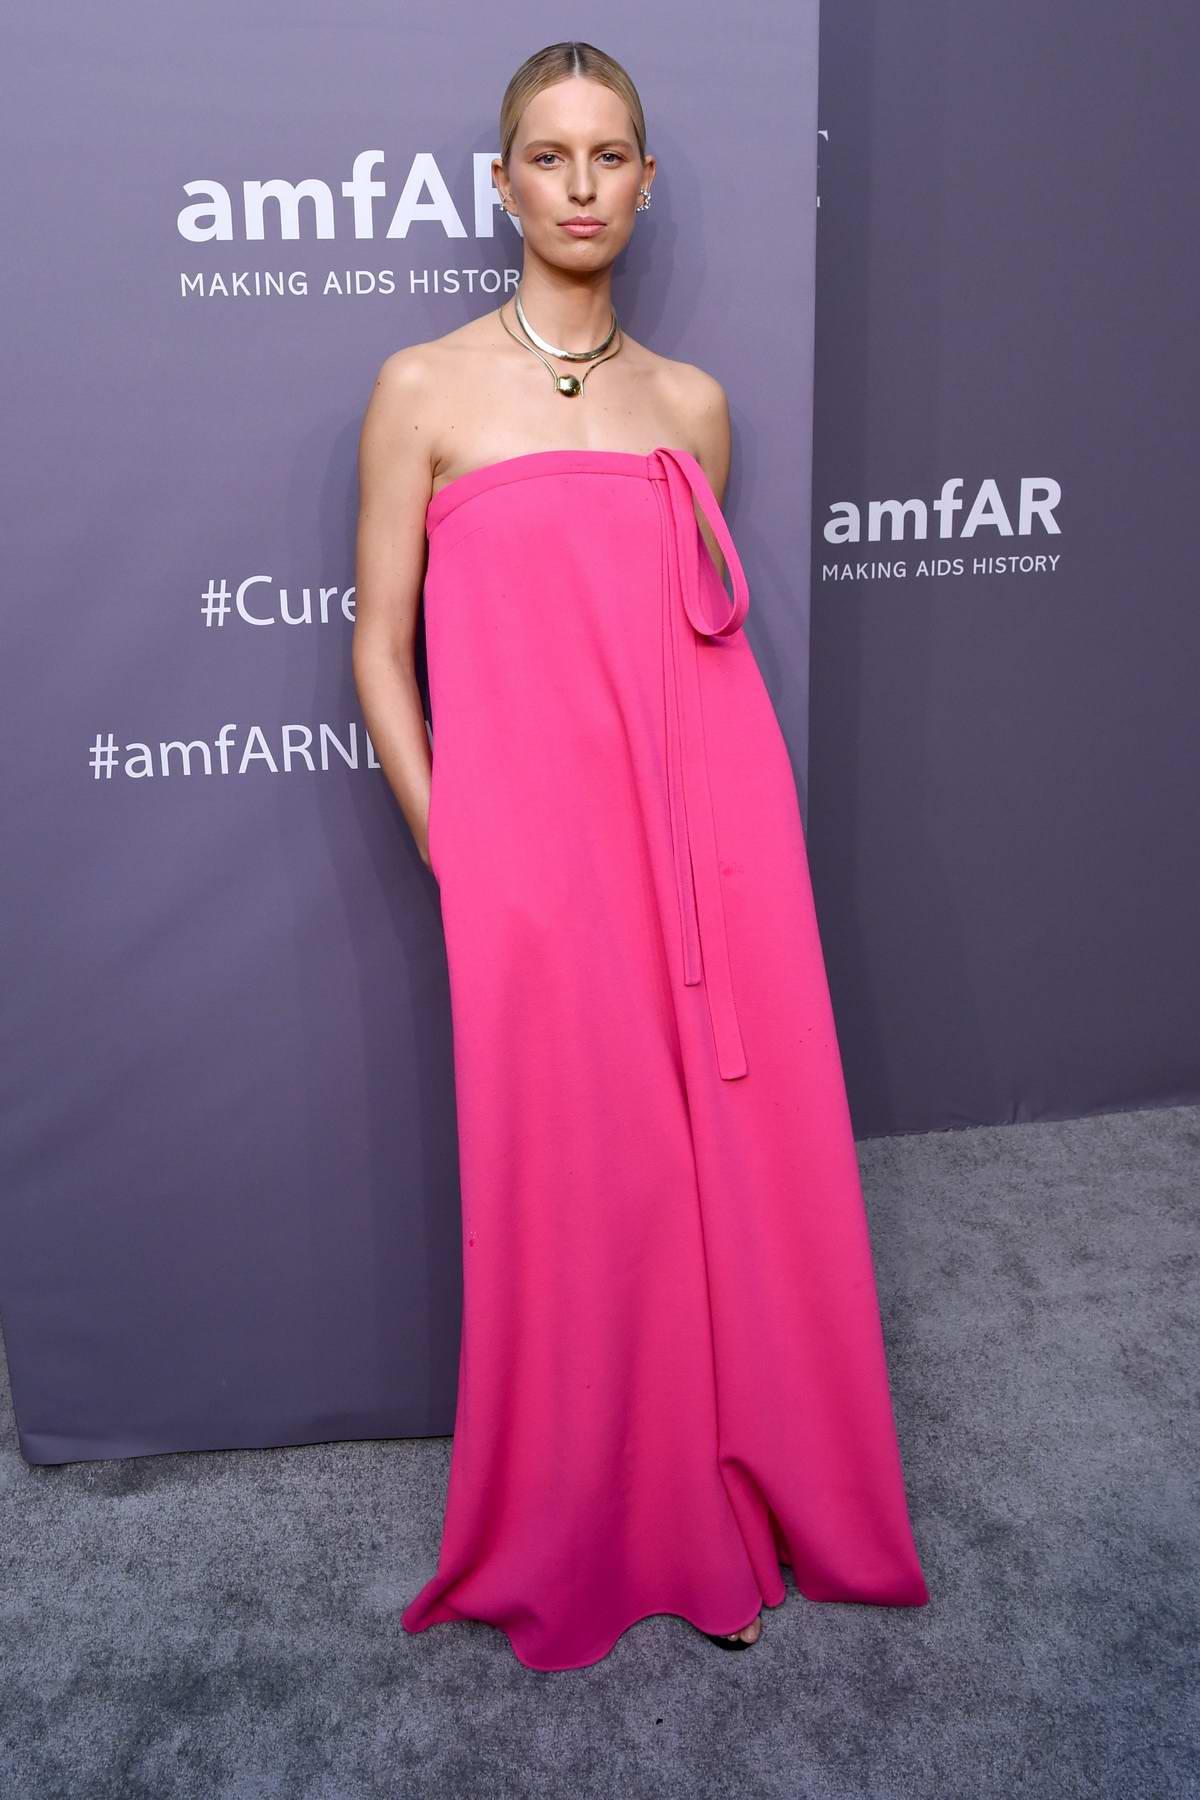 Karolina Kurkova attends amfAR New York Gala 2019 at Cipriani Wall Street in New York City